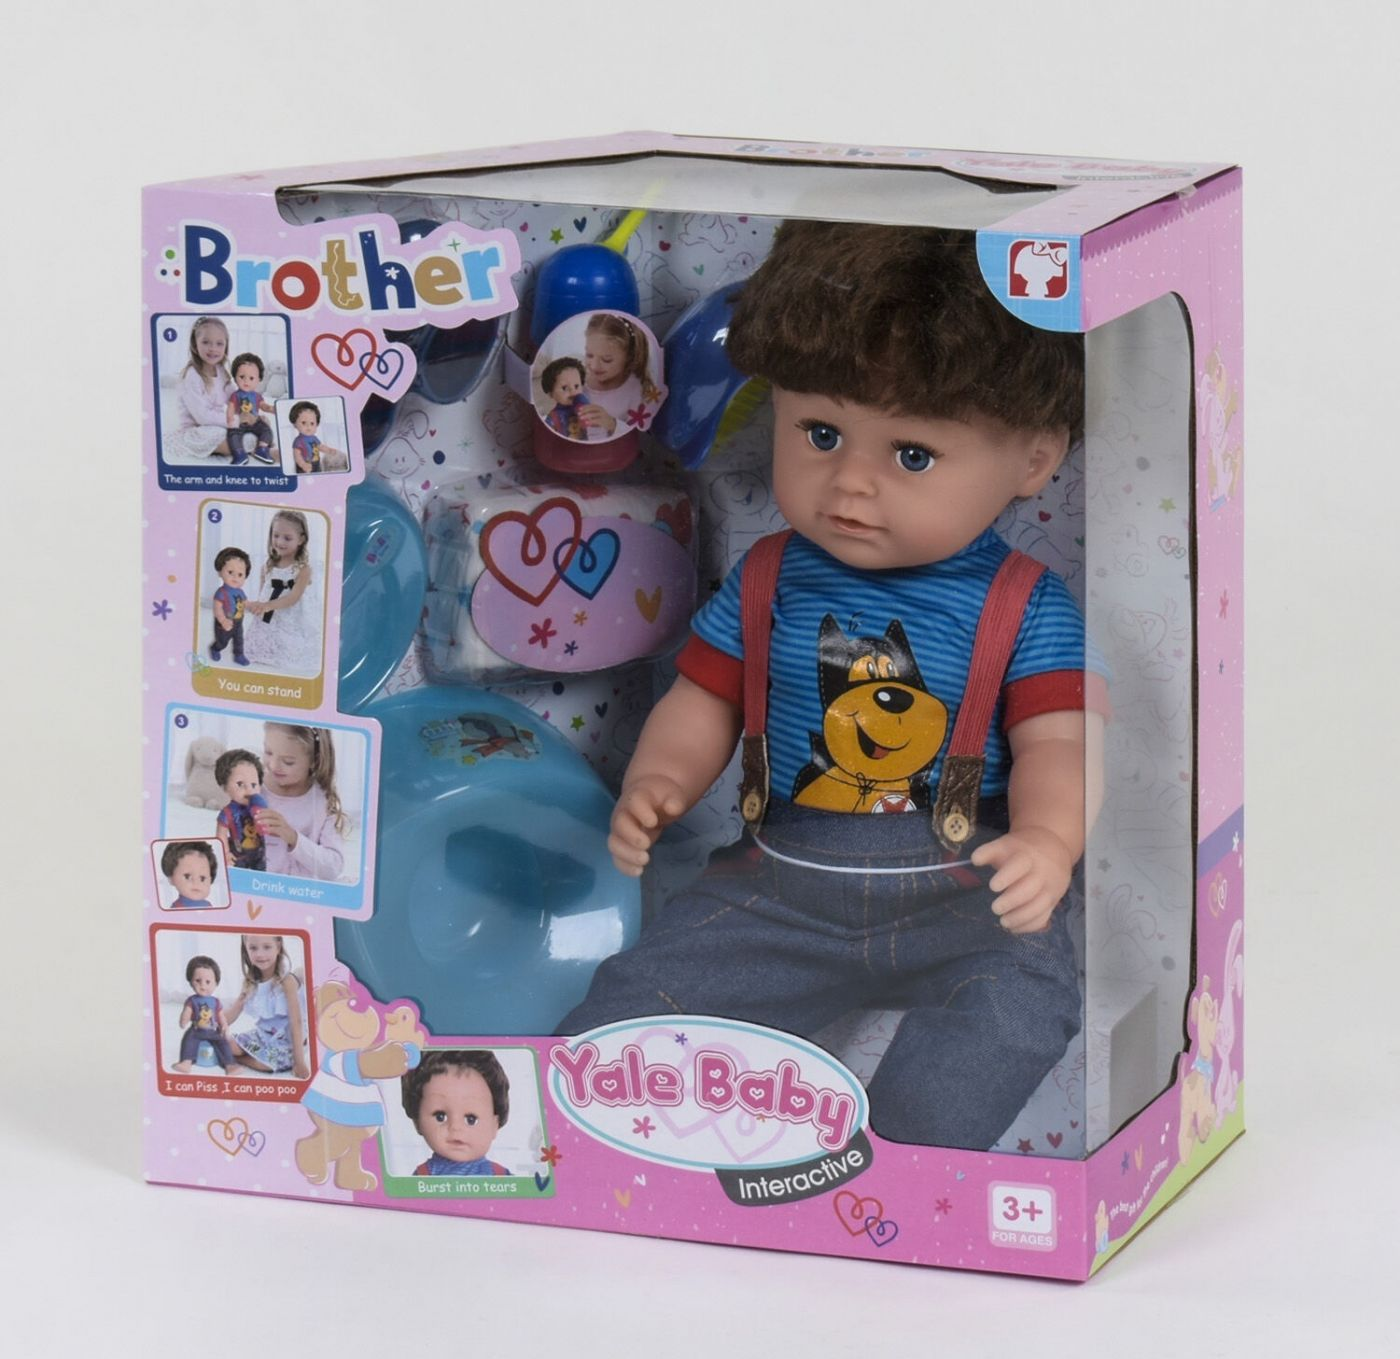 Кукла пупс Baby doll Brother брат интерактивный (BLB001D)